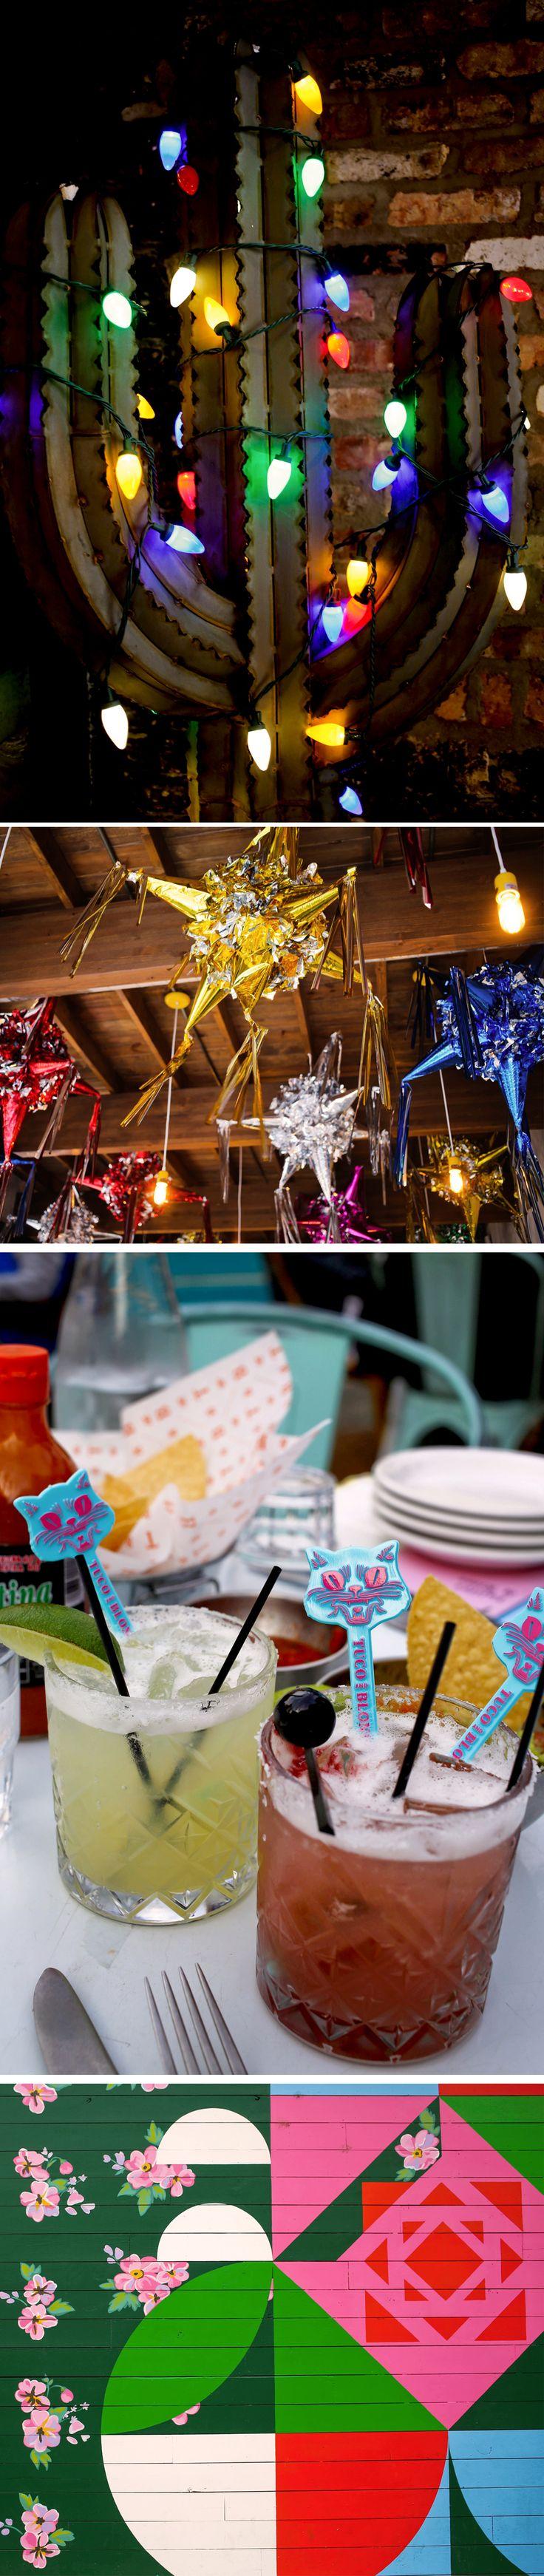 Best 25 Mexican restaurants in chicago ideas on Pinterest